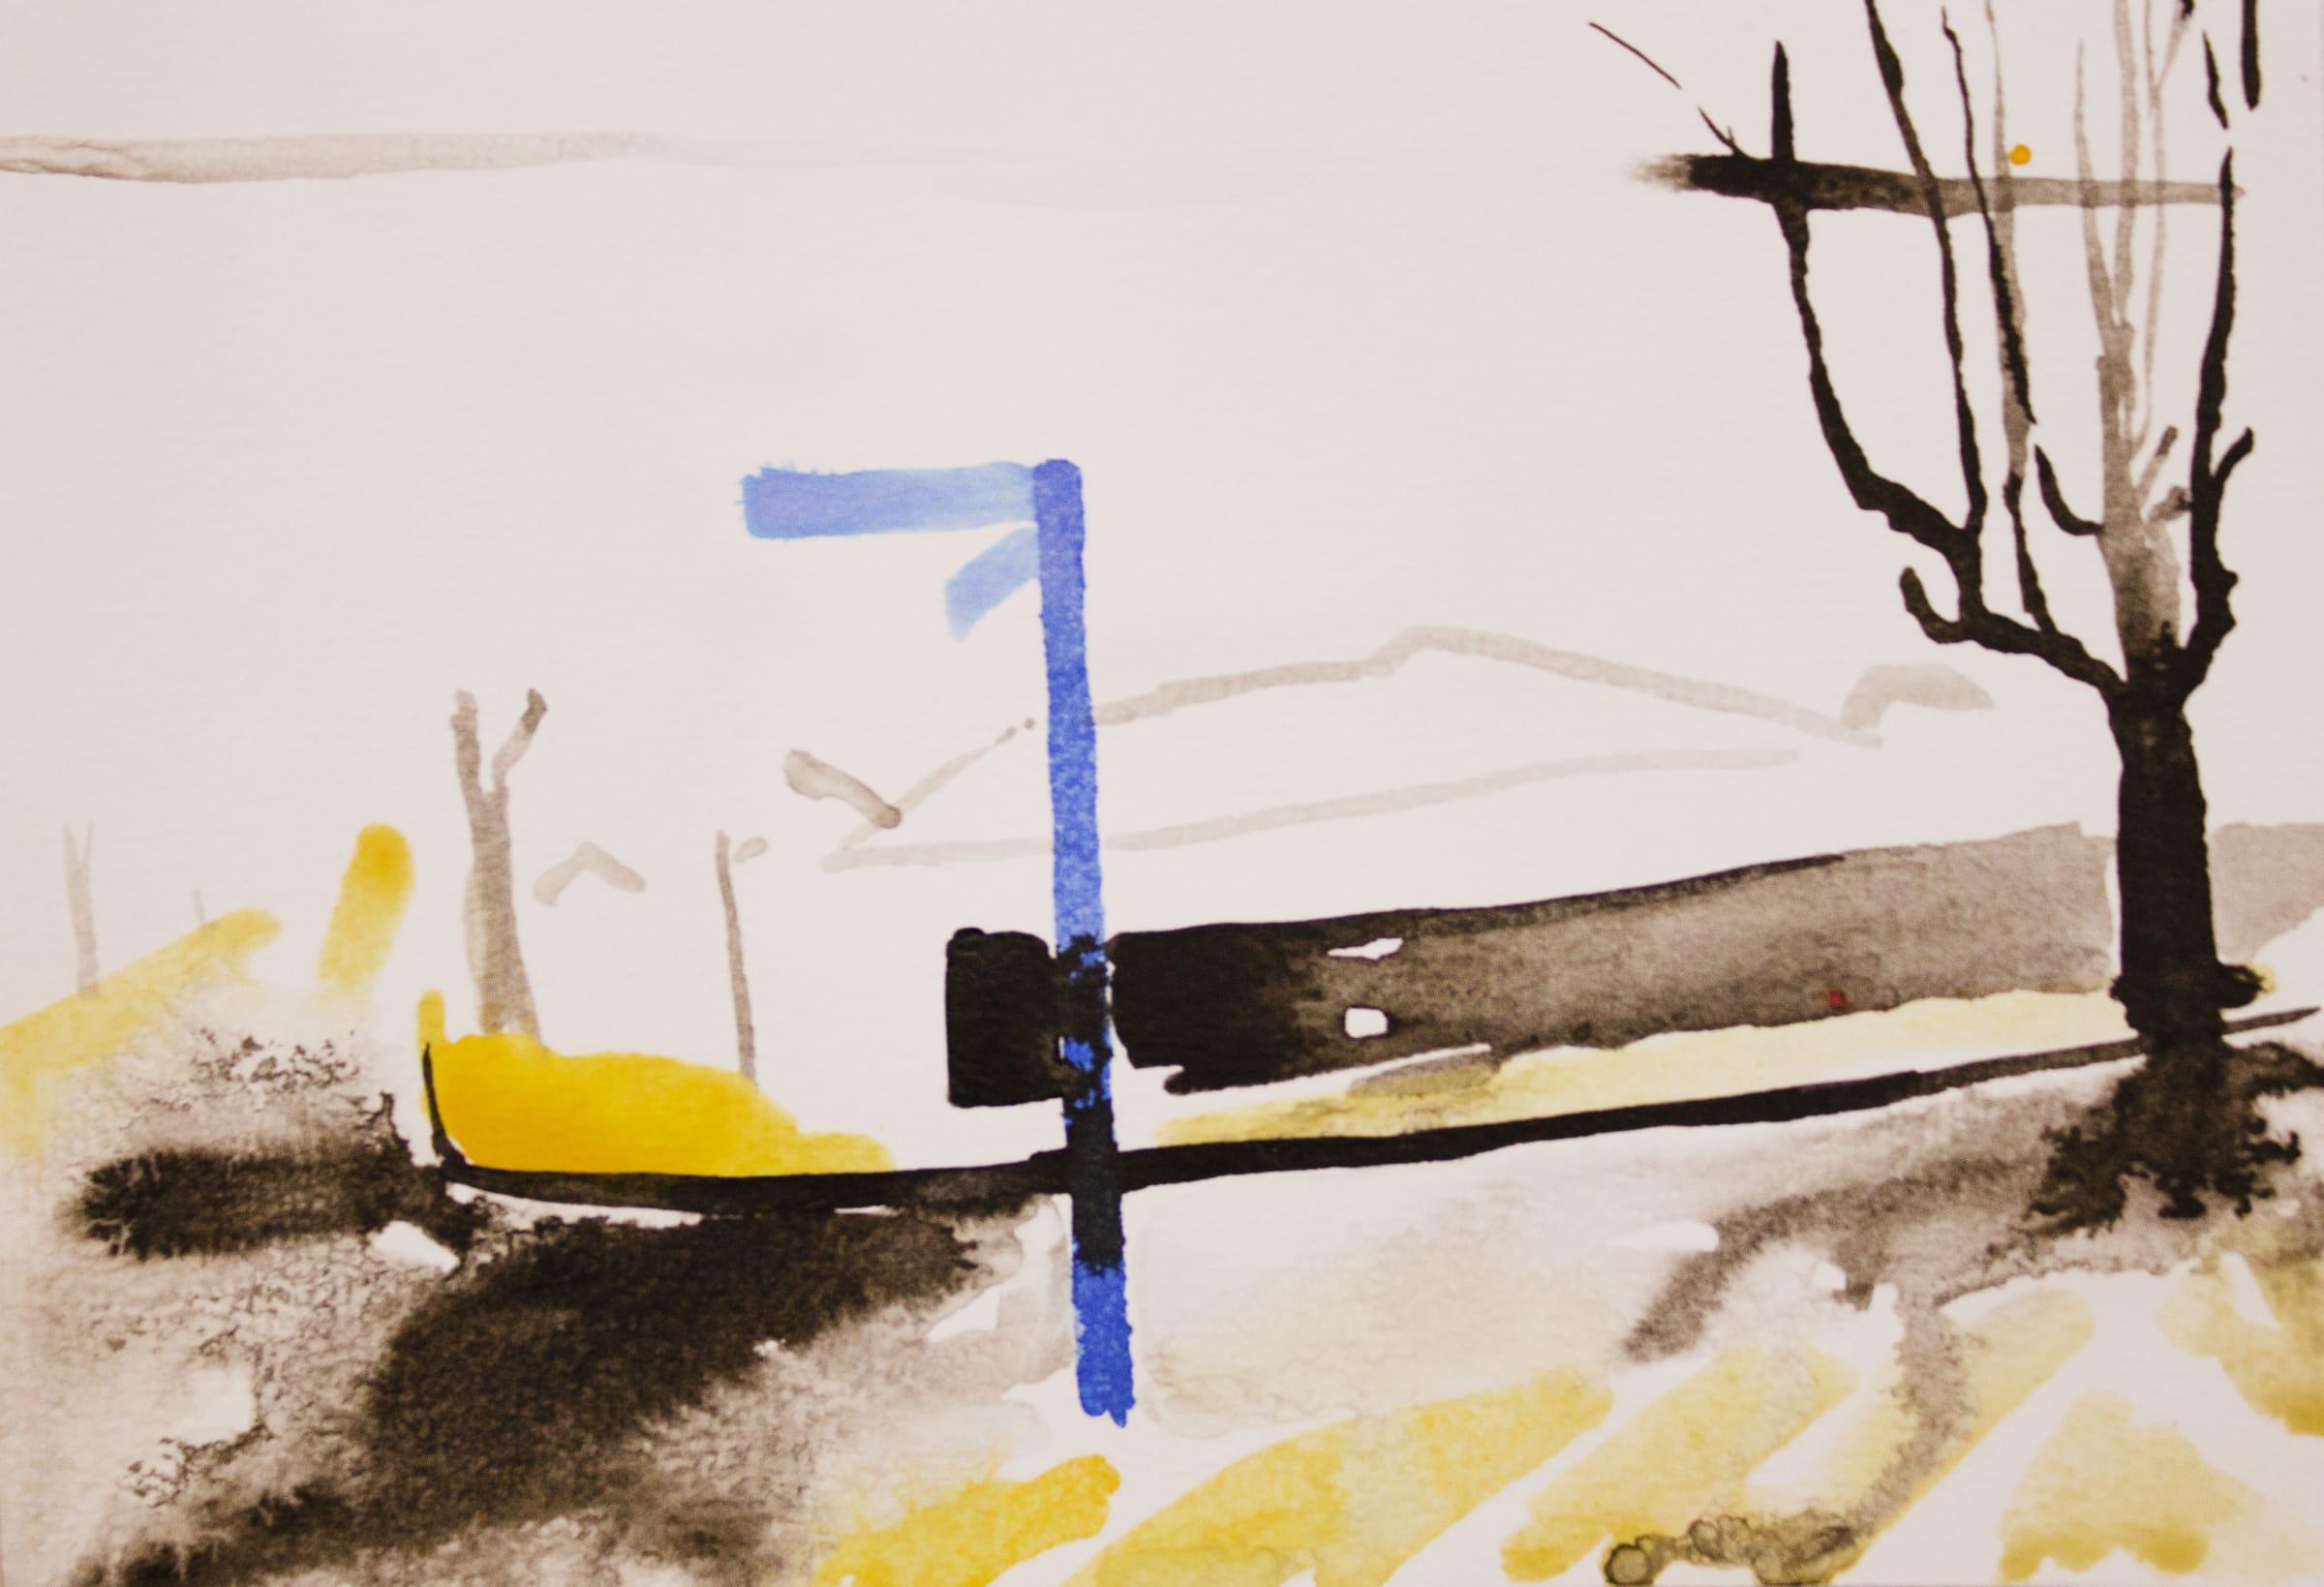 <span class=&#34;link fancybox-details-link&#34;><a href=&#34;/artists/88-louise-van-der-bijl/works/2280-louise-van-der-bijl-inktober-day-18-2018/&#34;>View Detail Page</a></span><div class=&#34;artist&#34;><strong>Louise Van Der Bijl</strong></div> <div class=&#34;title&#34;><em>Inktober Day 18</em>, 2018</div> <div class=&#34;medium&#34;>Ink On Paper</div> <div class=&#34;dimensions&#34;>15.1cm x 21.1cm</div><div class=&#34;price&#34;>R400.00</div>